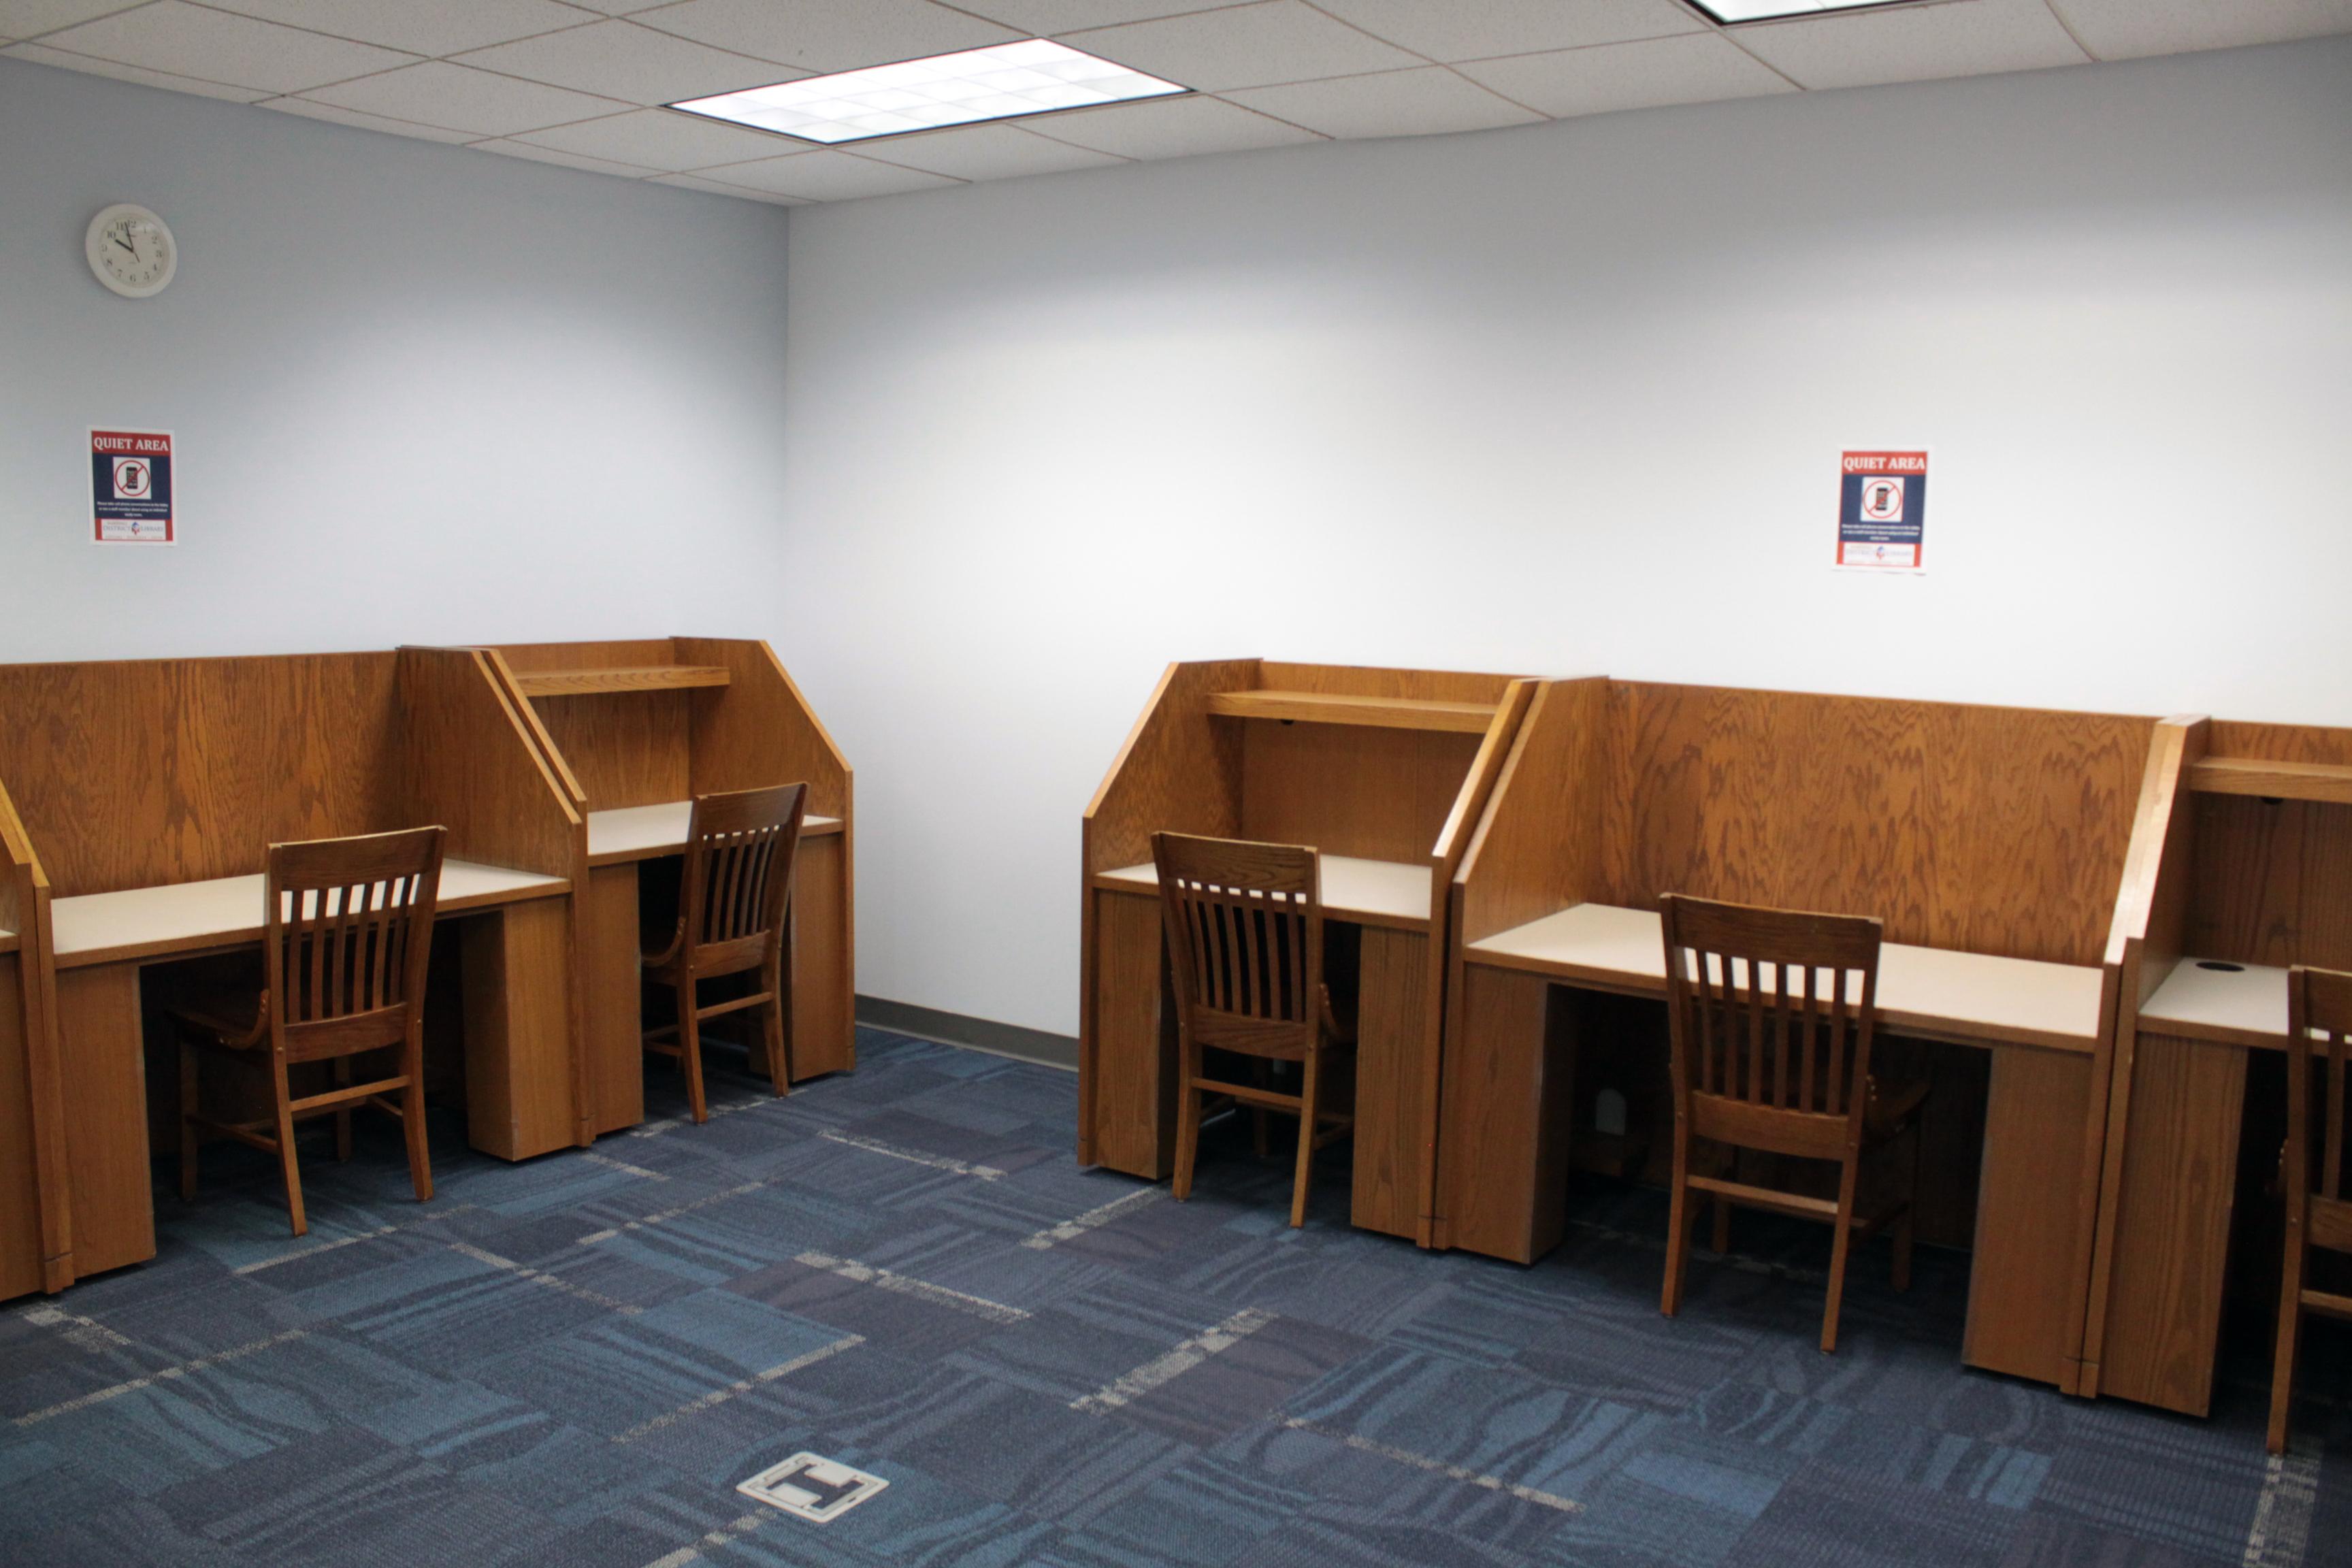 Quiet Study Room